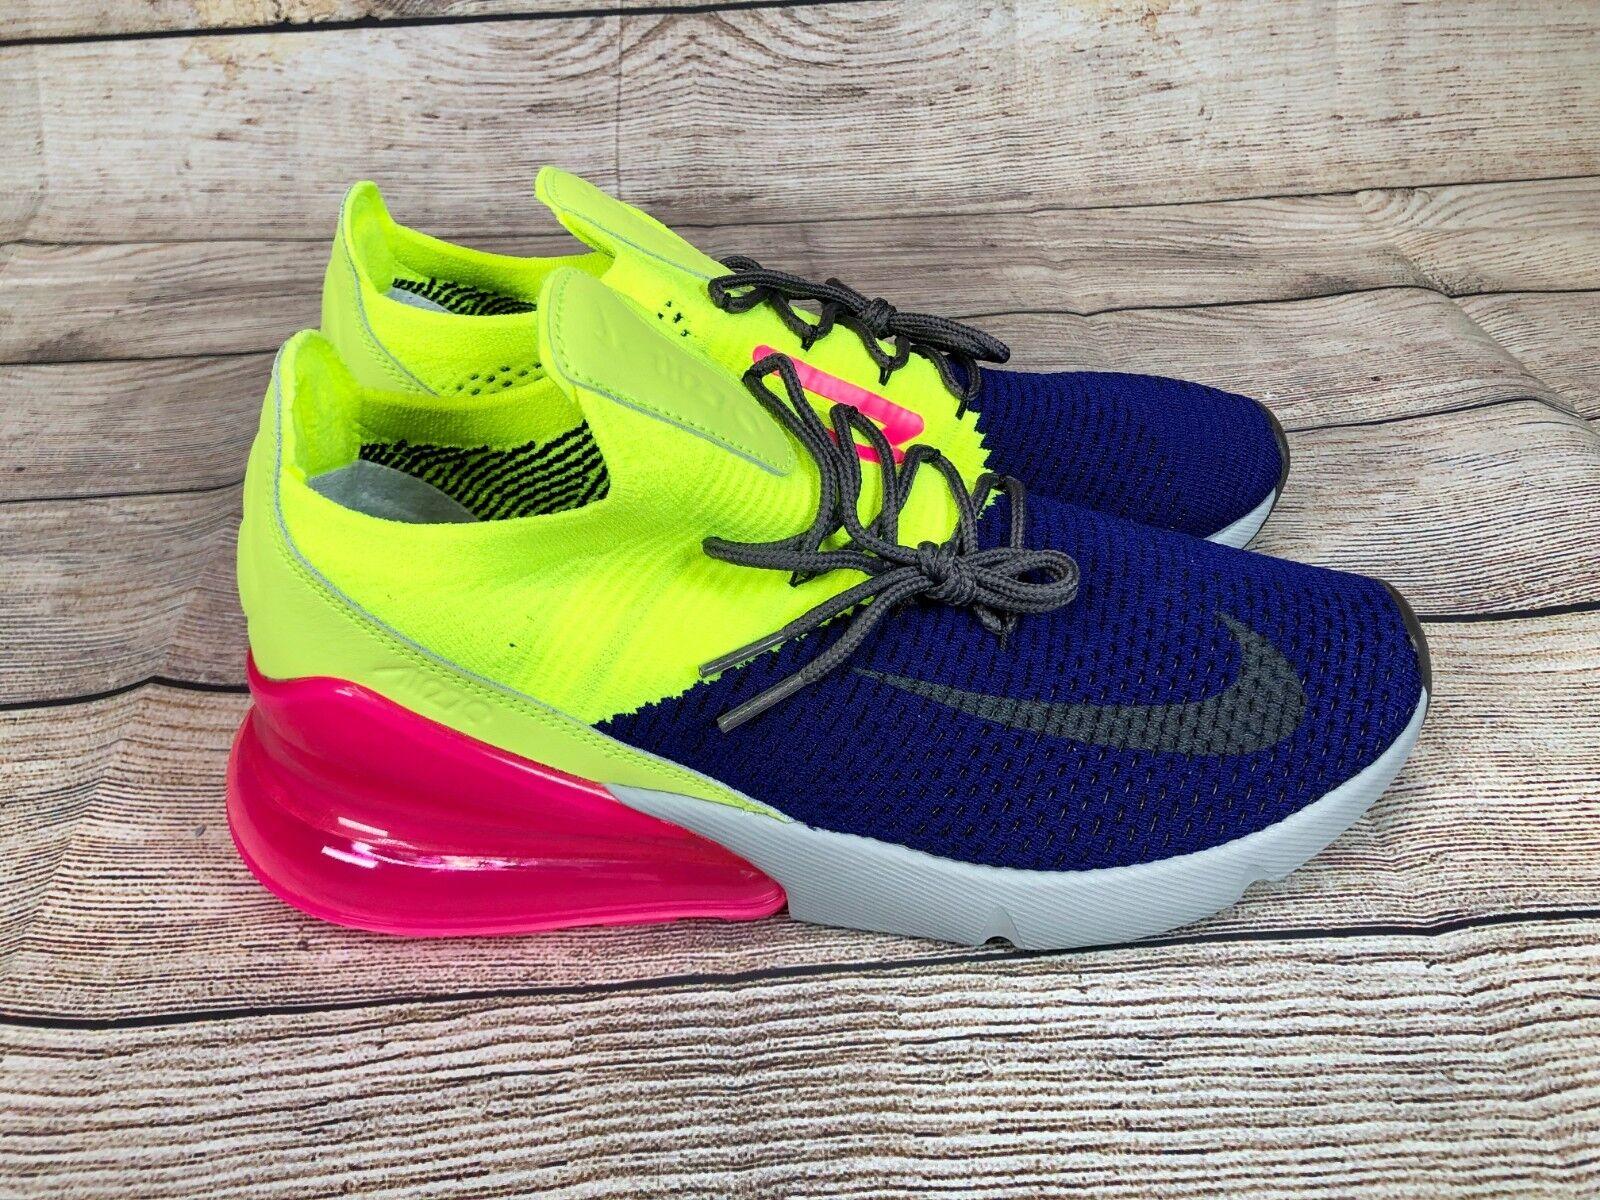 hot sale 2017 Nike Air Max Bw Ultra Mens 819475 011 Cool